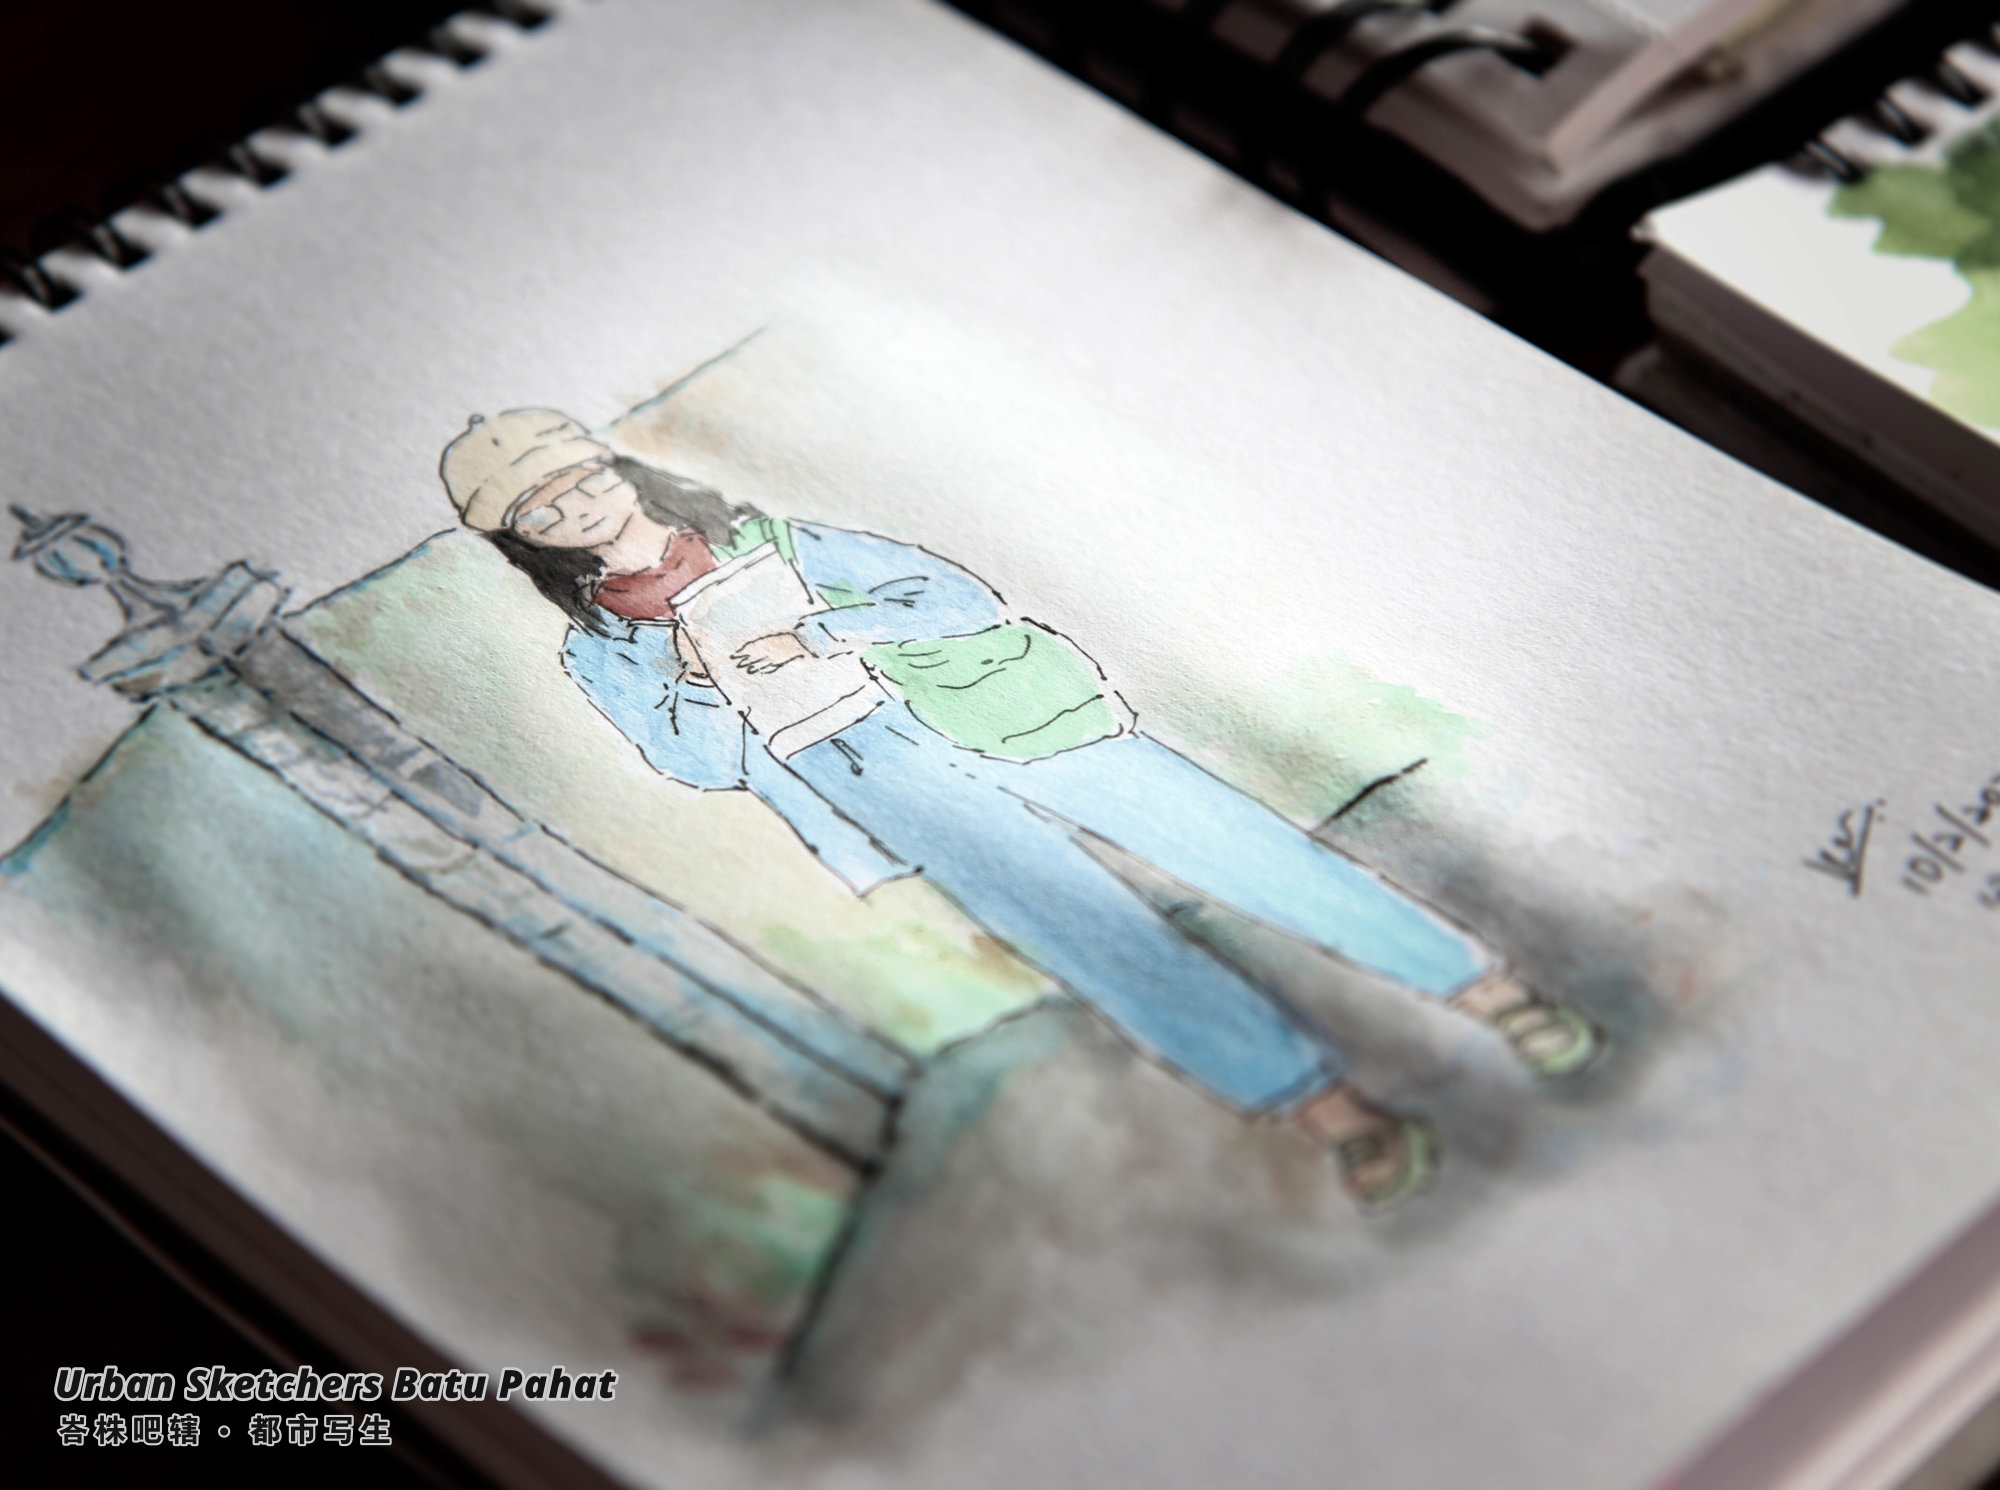 Urban Sketchers Batu Pahat Johor Malaysia Art Drawing Sketching 马来西亚 柔佛 峇株吧辖都市写生 艺术 画画 A025